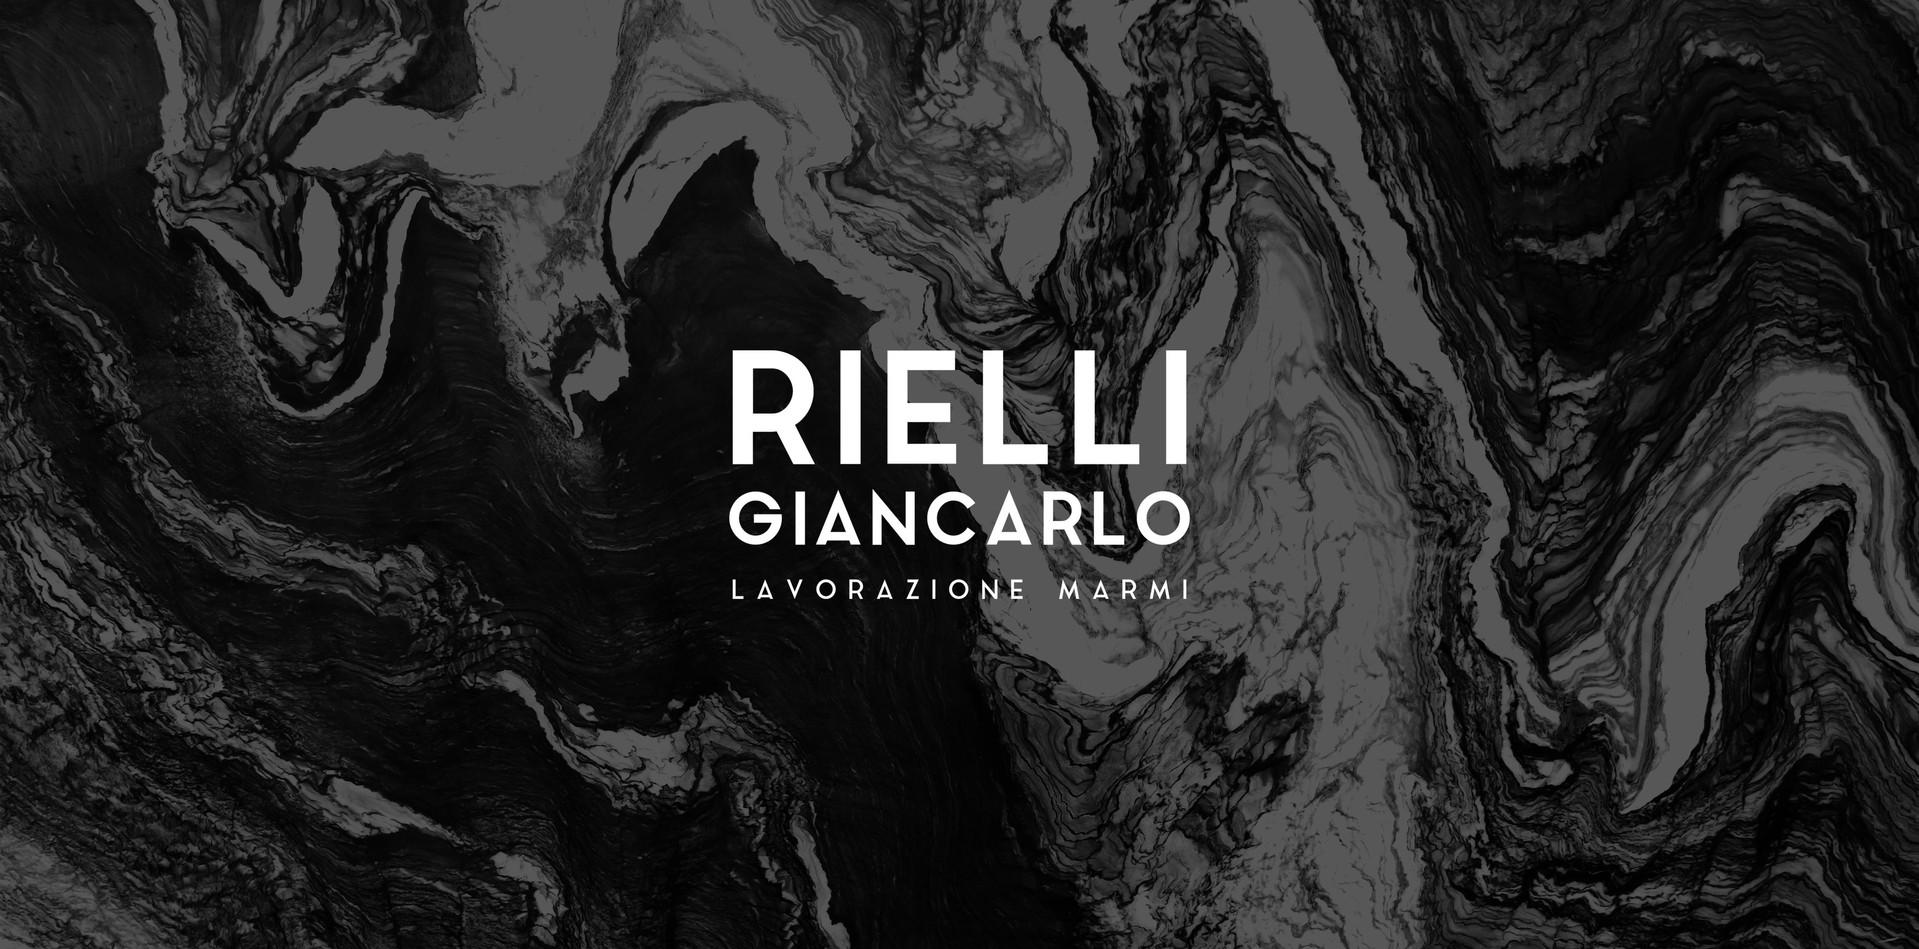 rielli_anteprima.jpg